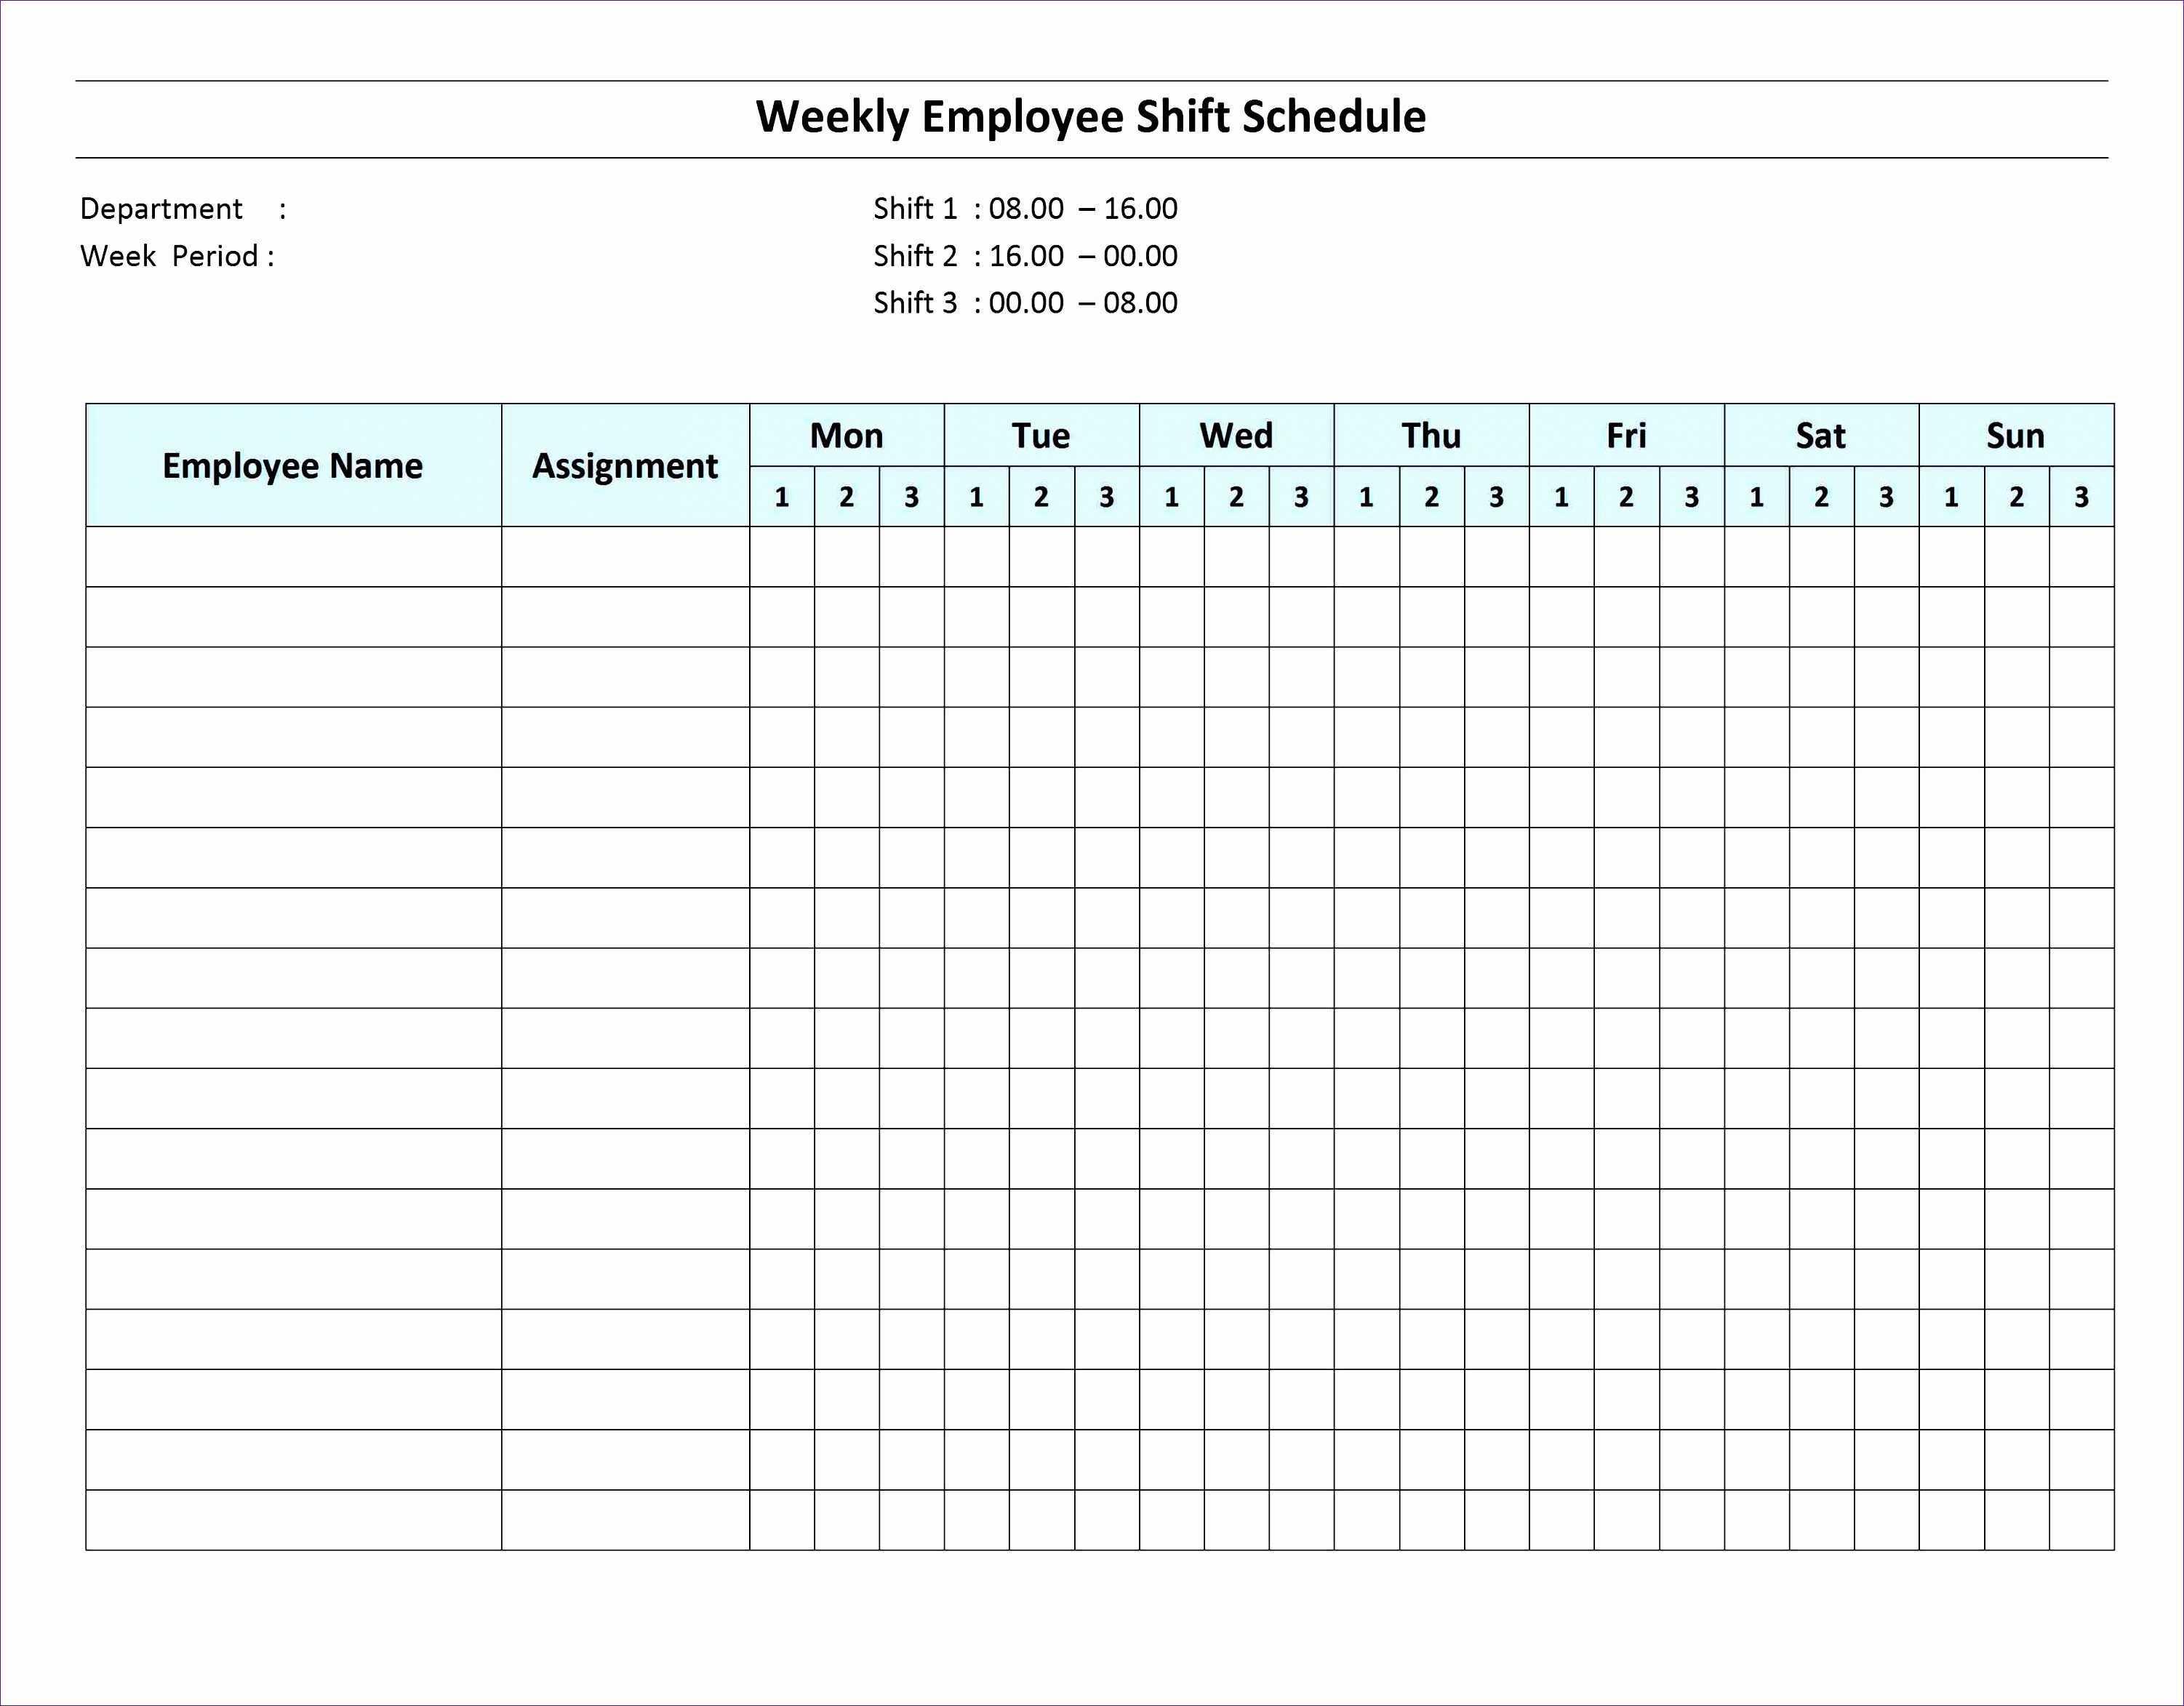 12 New Farm Bookkeeping Spreadsheet - Twables.site to Bookkeeping Spreadsheet Excel